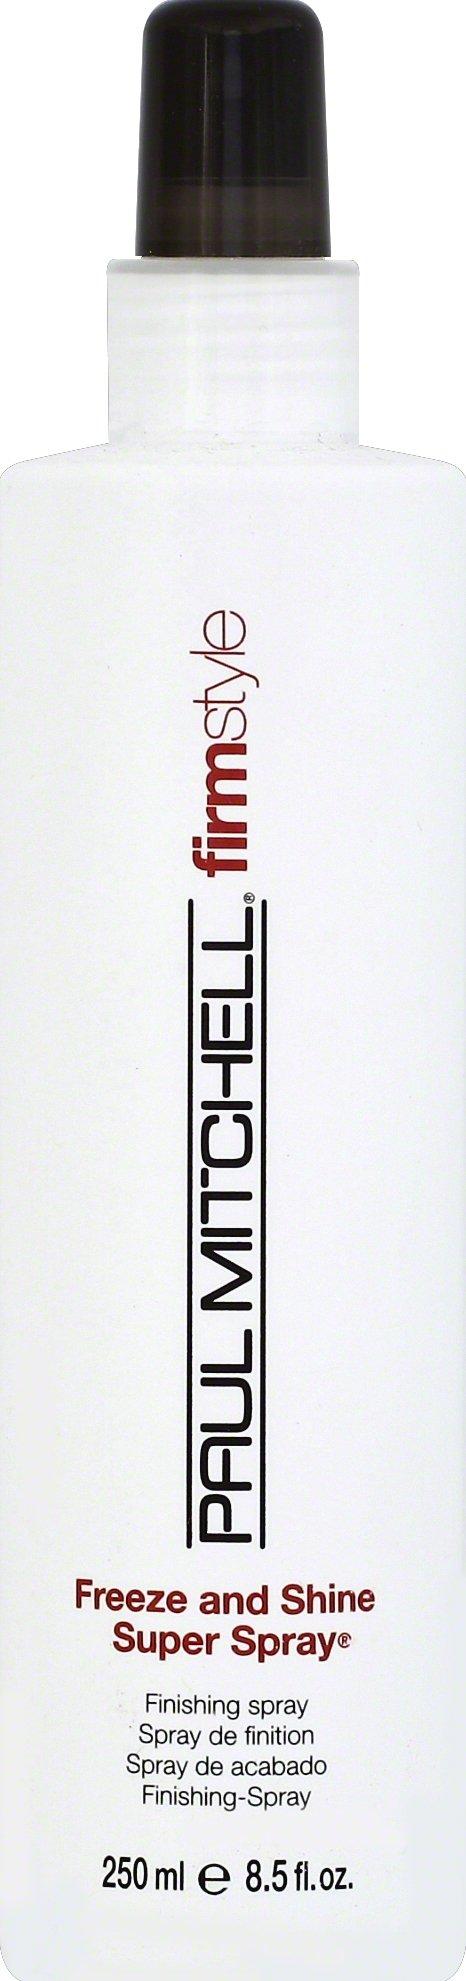 Paul Mitchell Firm Style Freeze & Shine 8.5 Fl. Oz. Super Hairspray -  19906